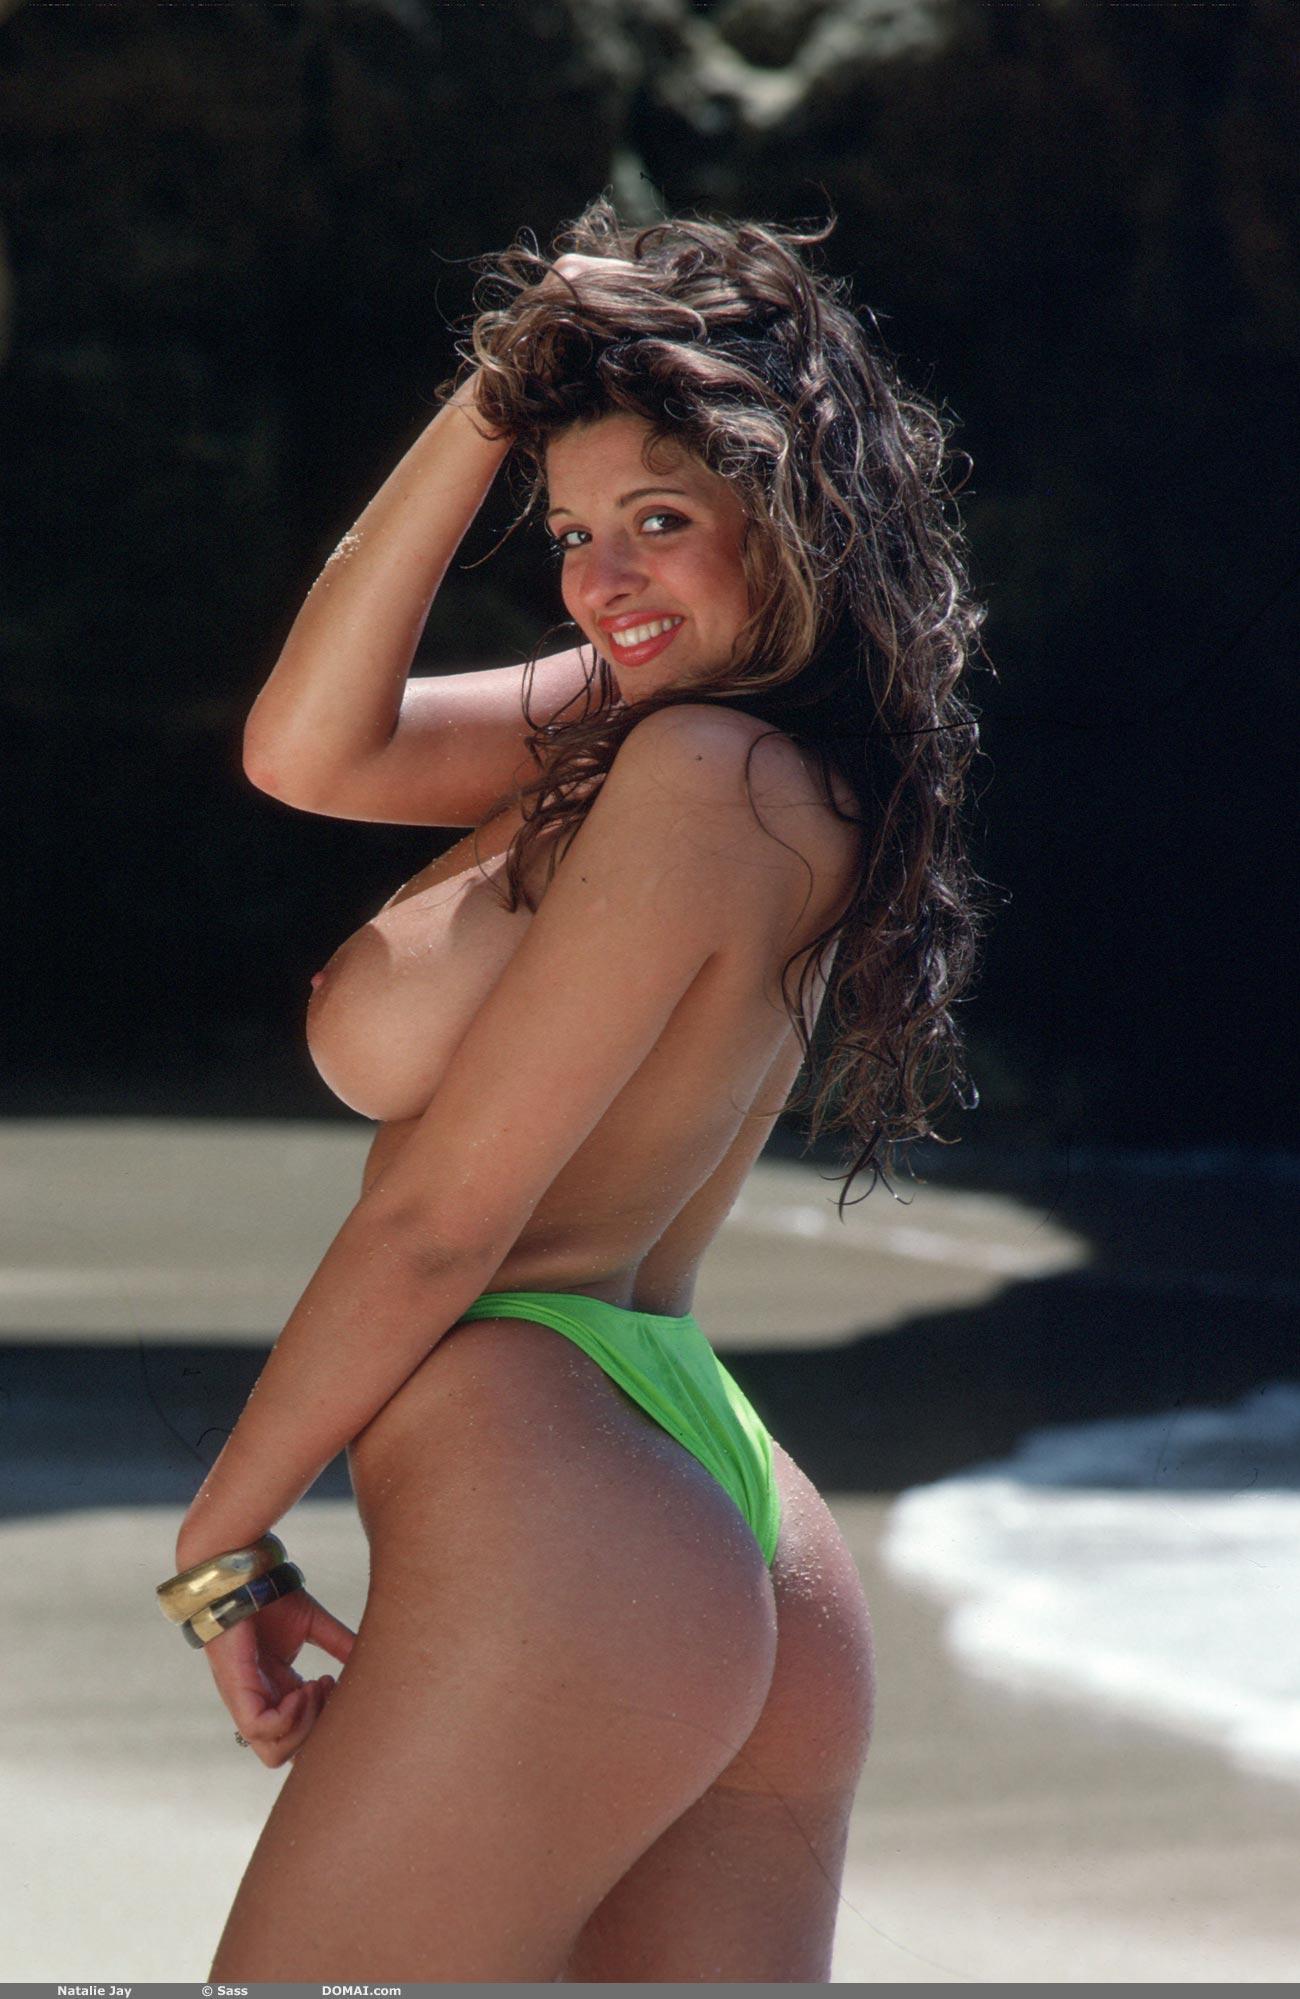 Natalie-Jay Beach Brunette - NudesPuri.com